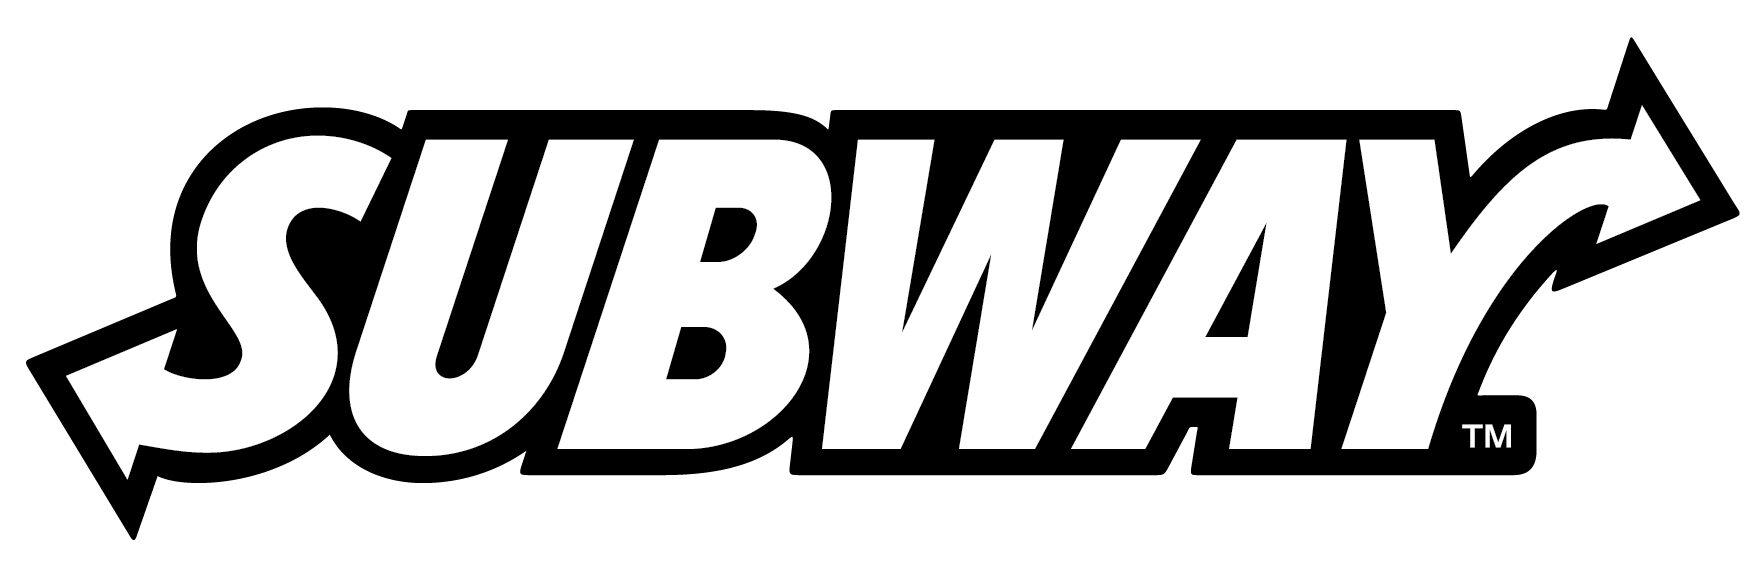 Subway-02